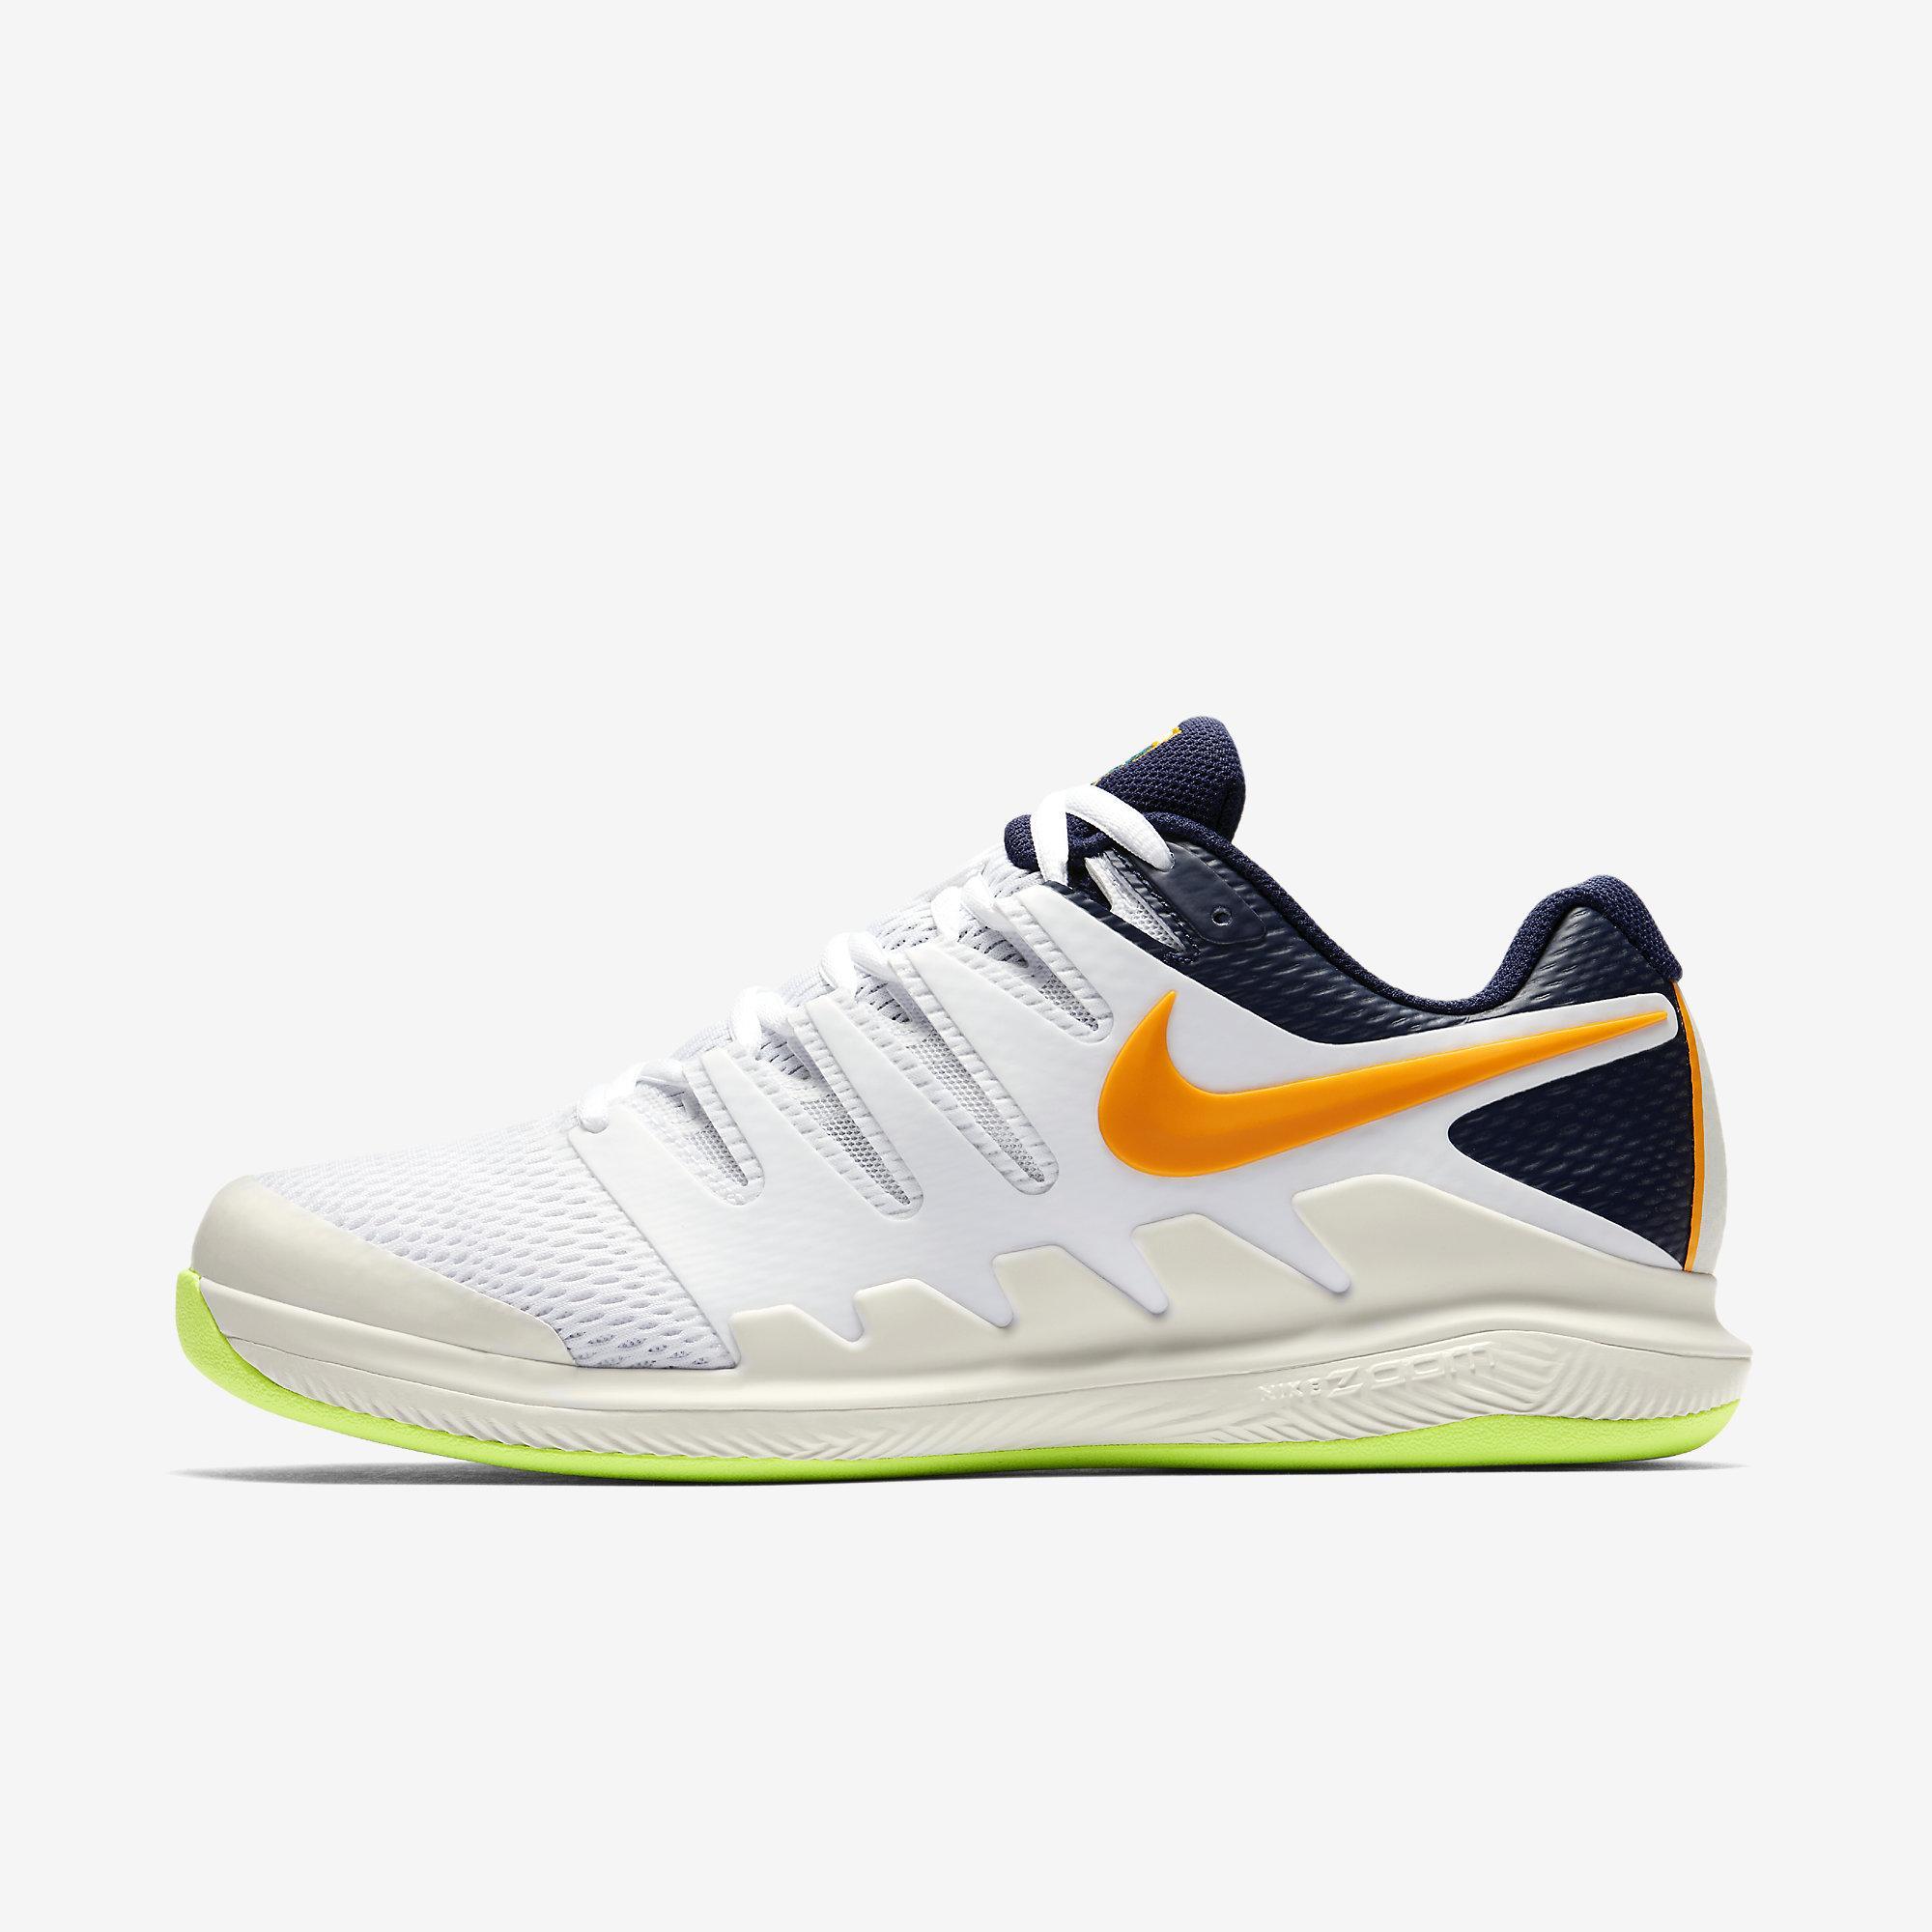 244676fa2534 Nike Mens Air Zoom Vapor X Carpet Tennis Shoes - Phantom Blackened Blue  White - Tennisnuts.com